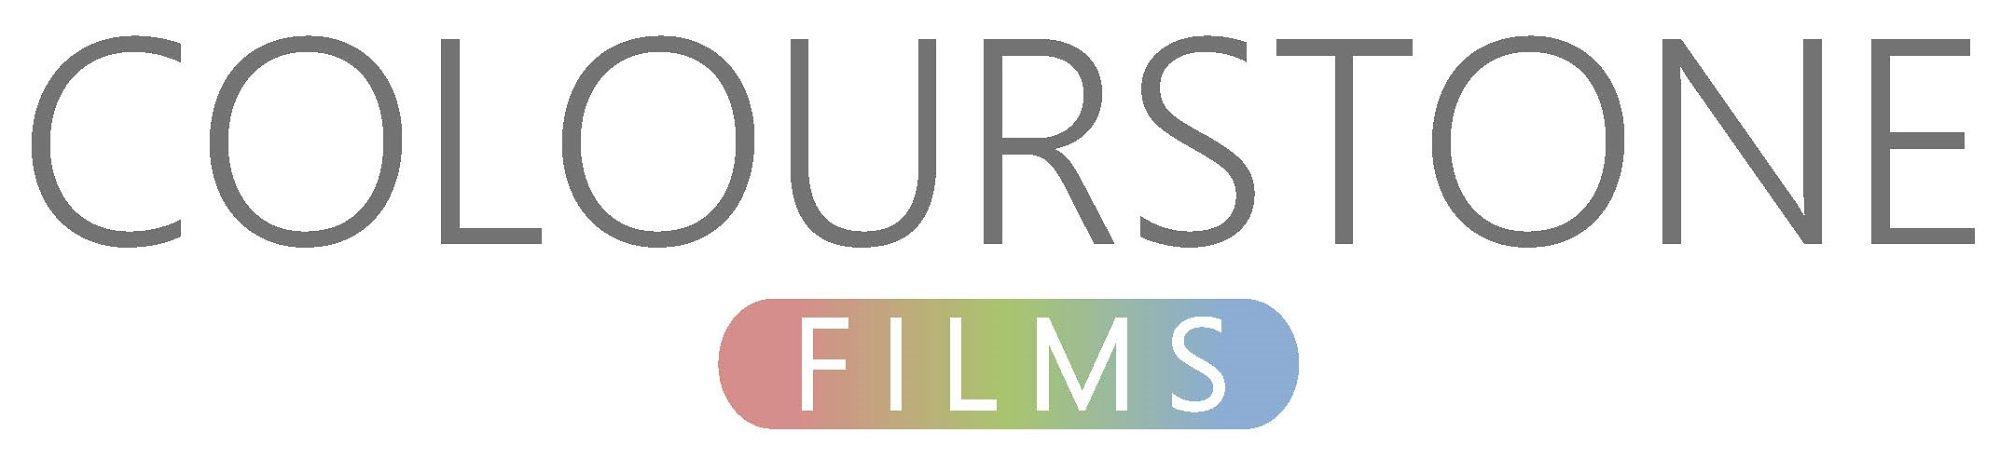 COLOURSTONE FILMS